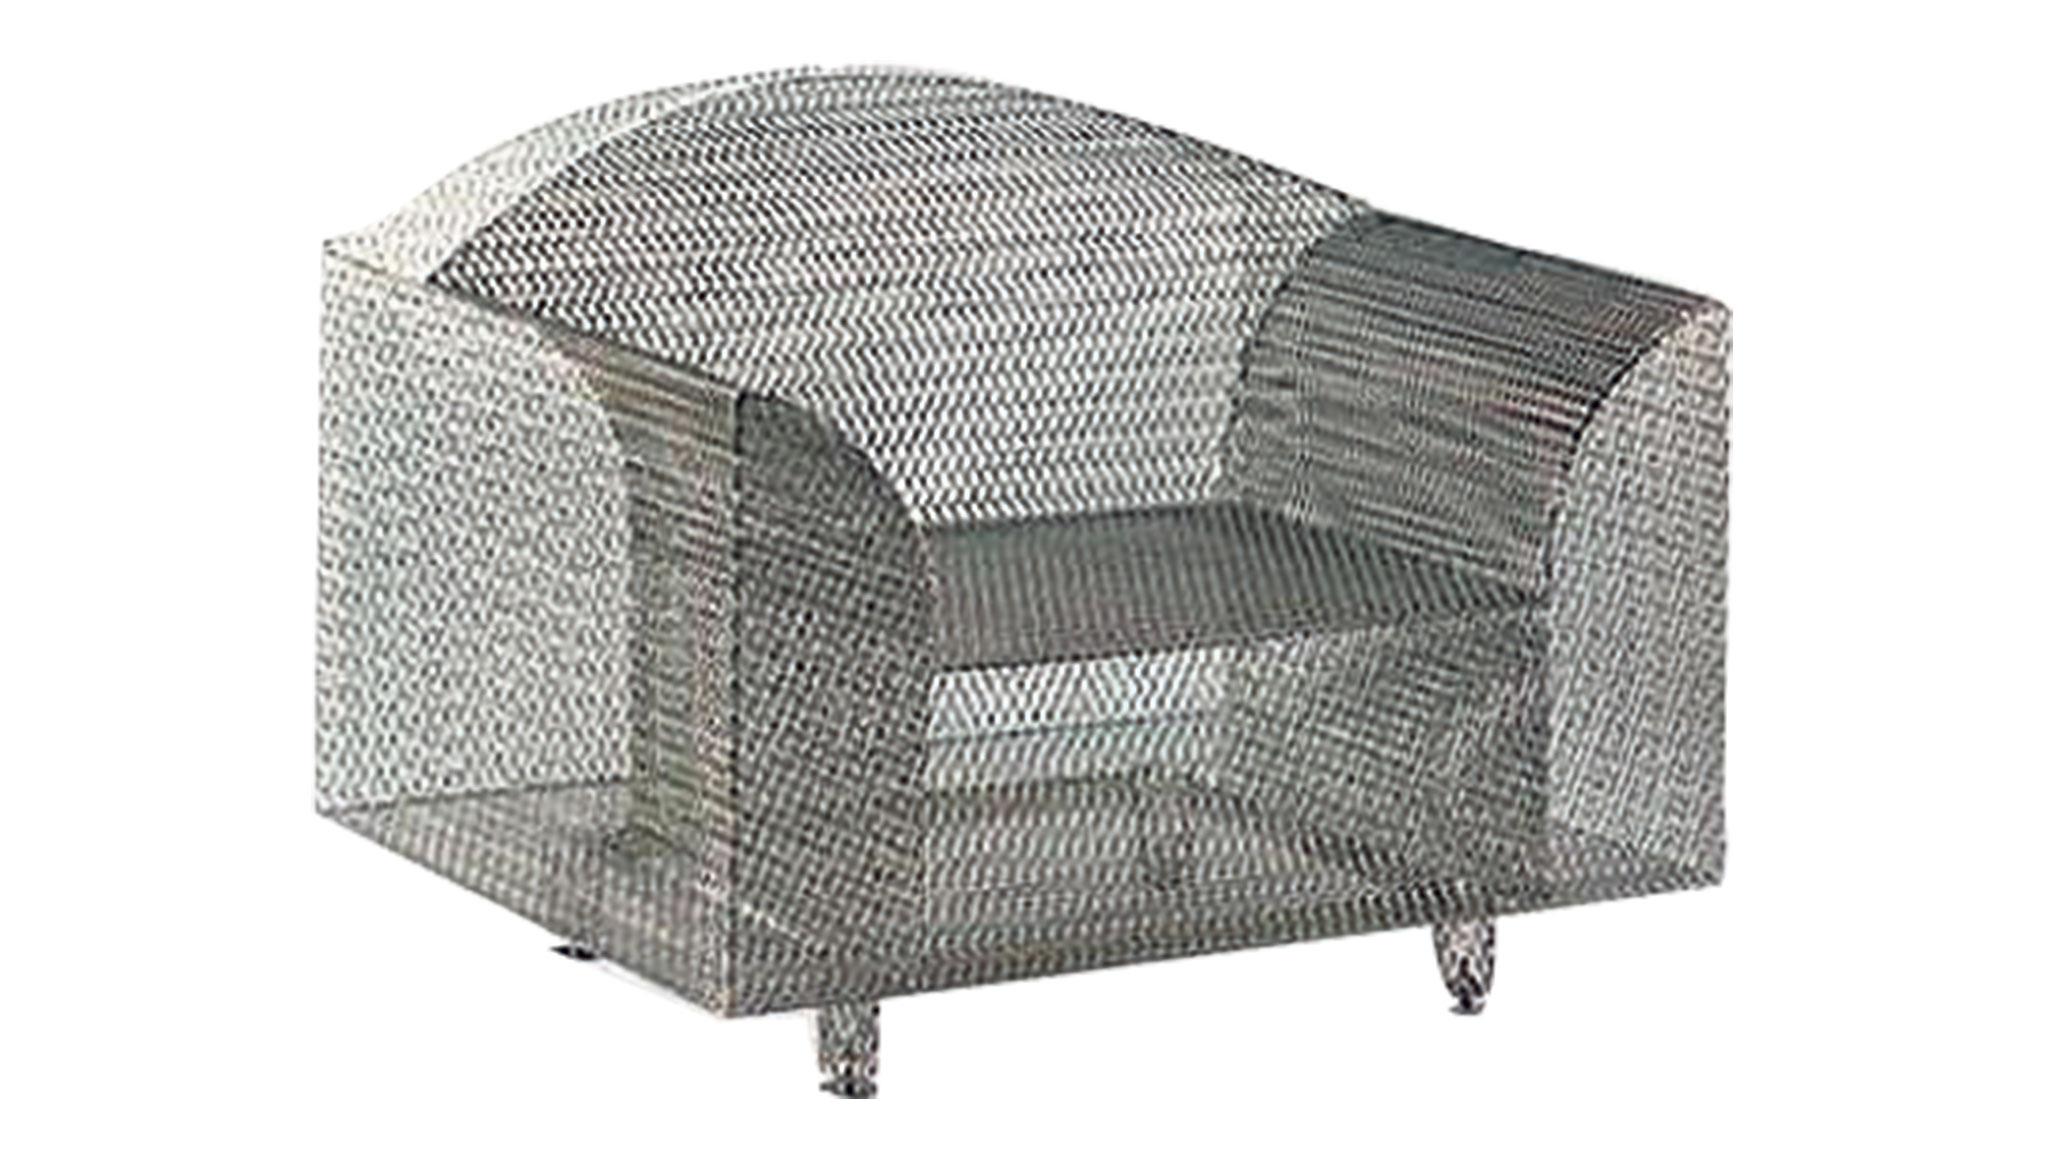 Design Classic: How High The Moon Armchair By Shiro Kuramata